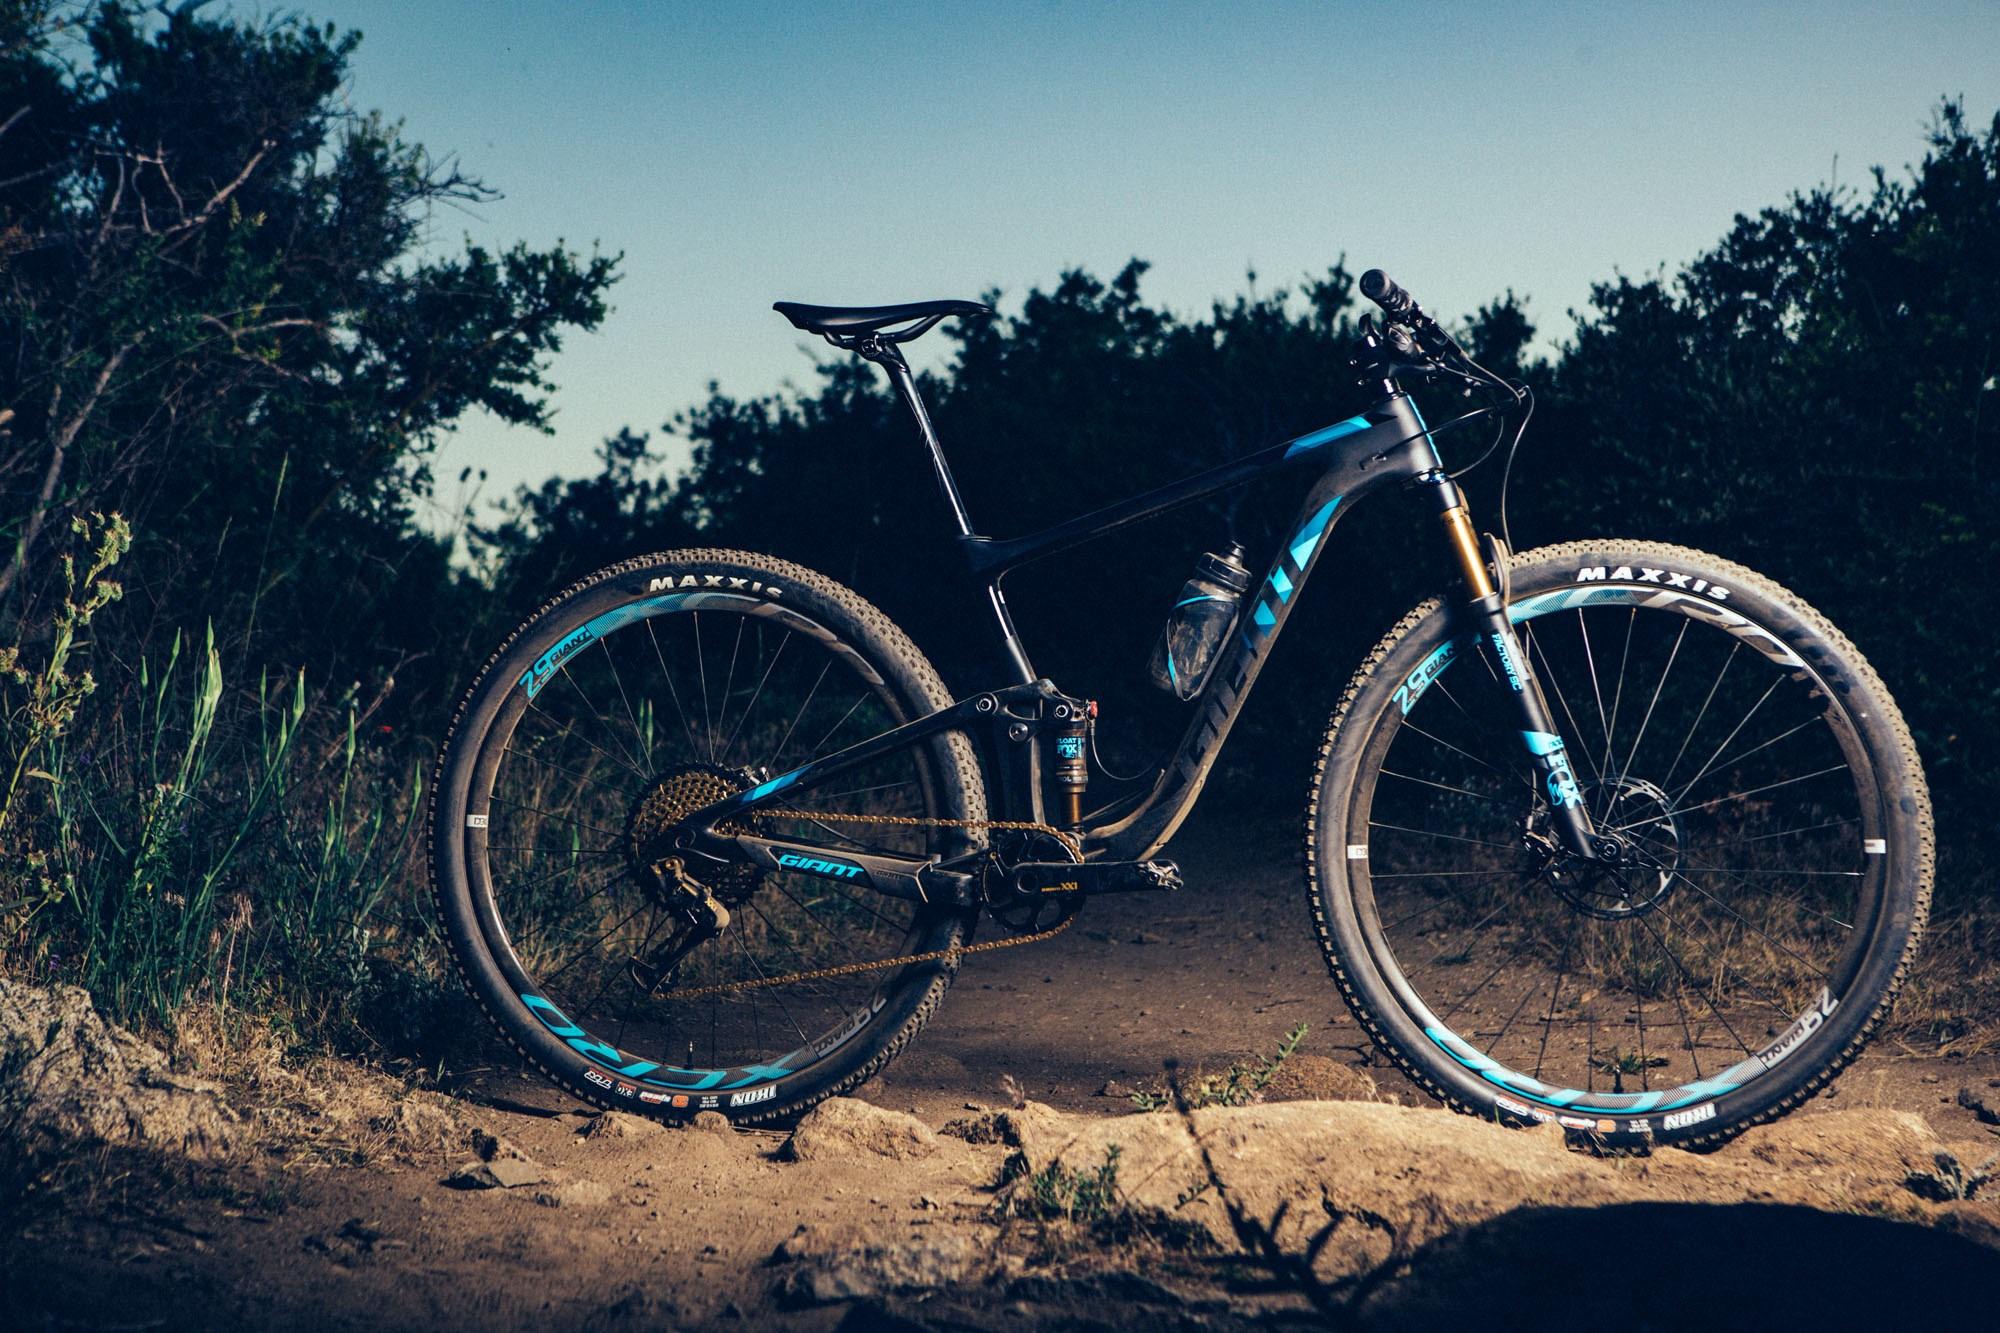 46620a3f882 Giant Releases All New Anthem 29 XC Race Bike - Singletracks ...